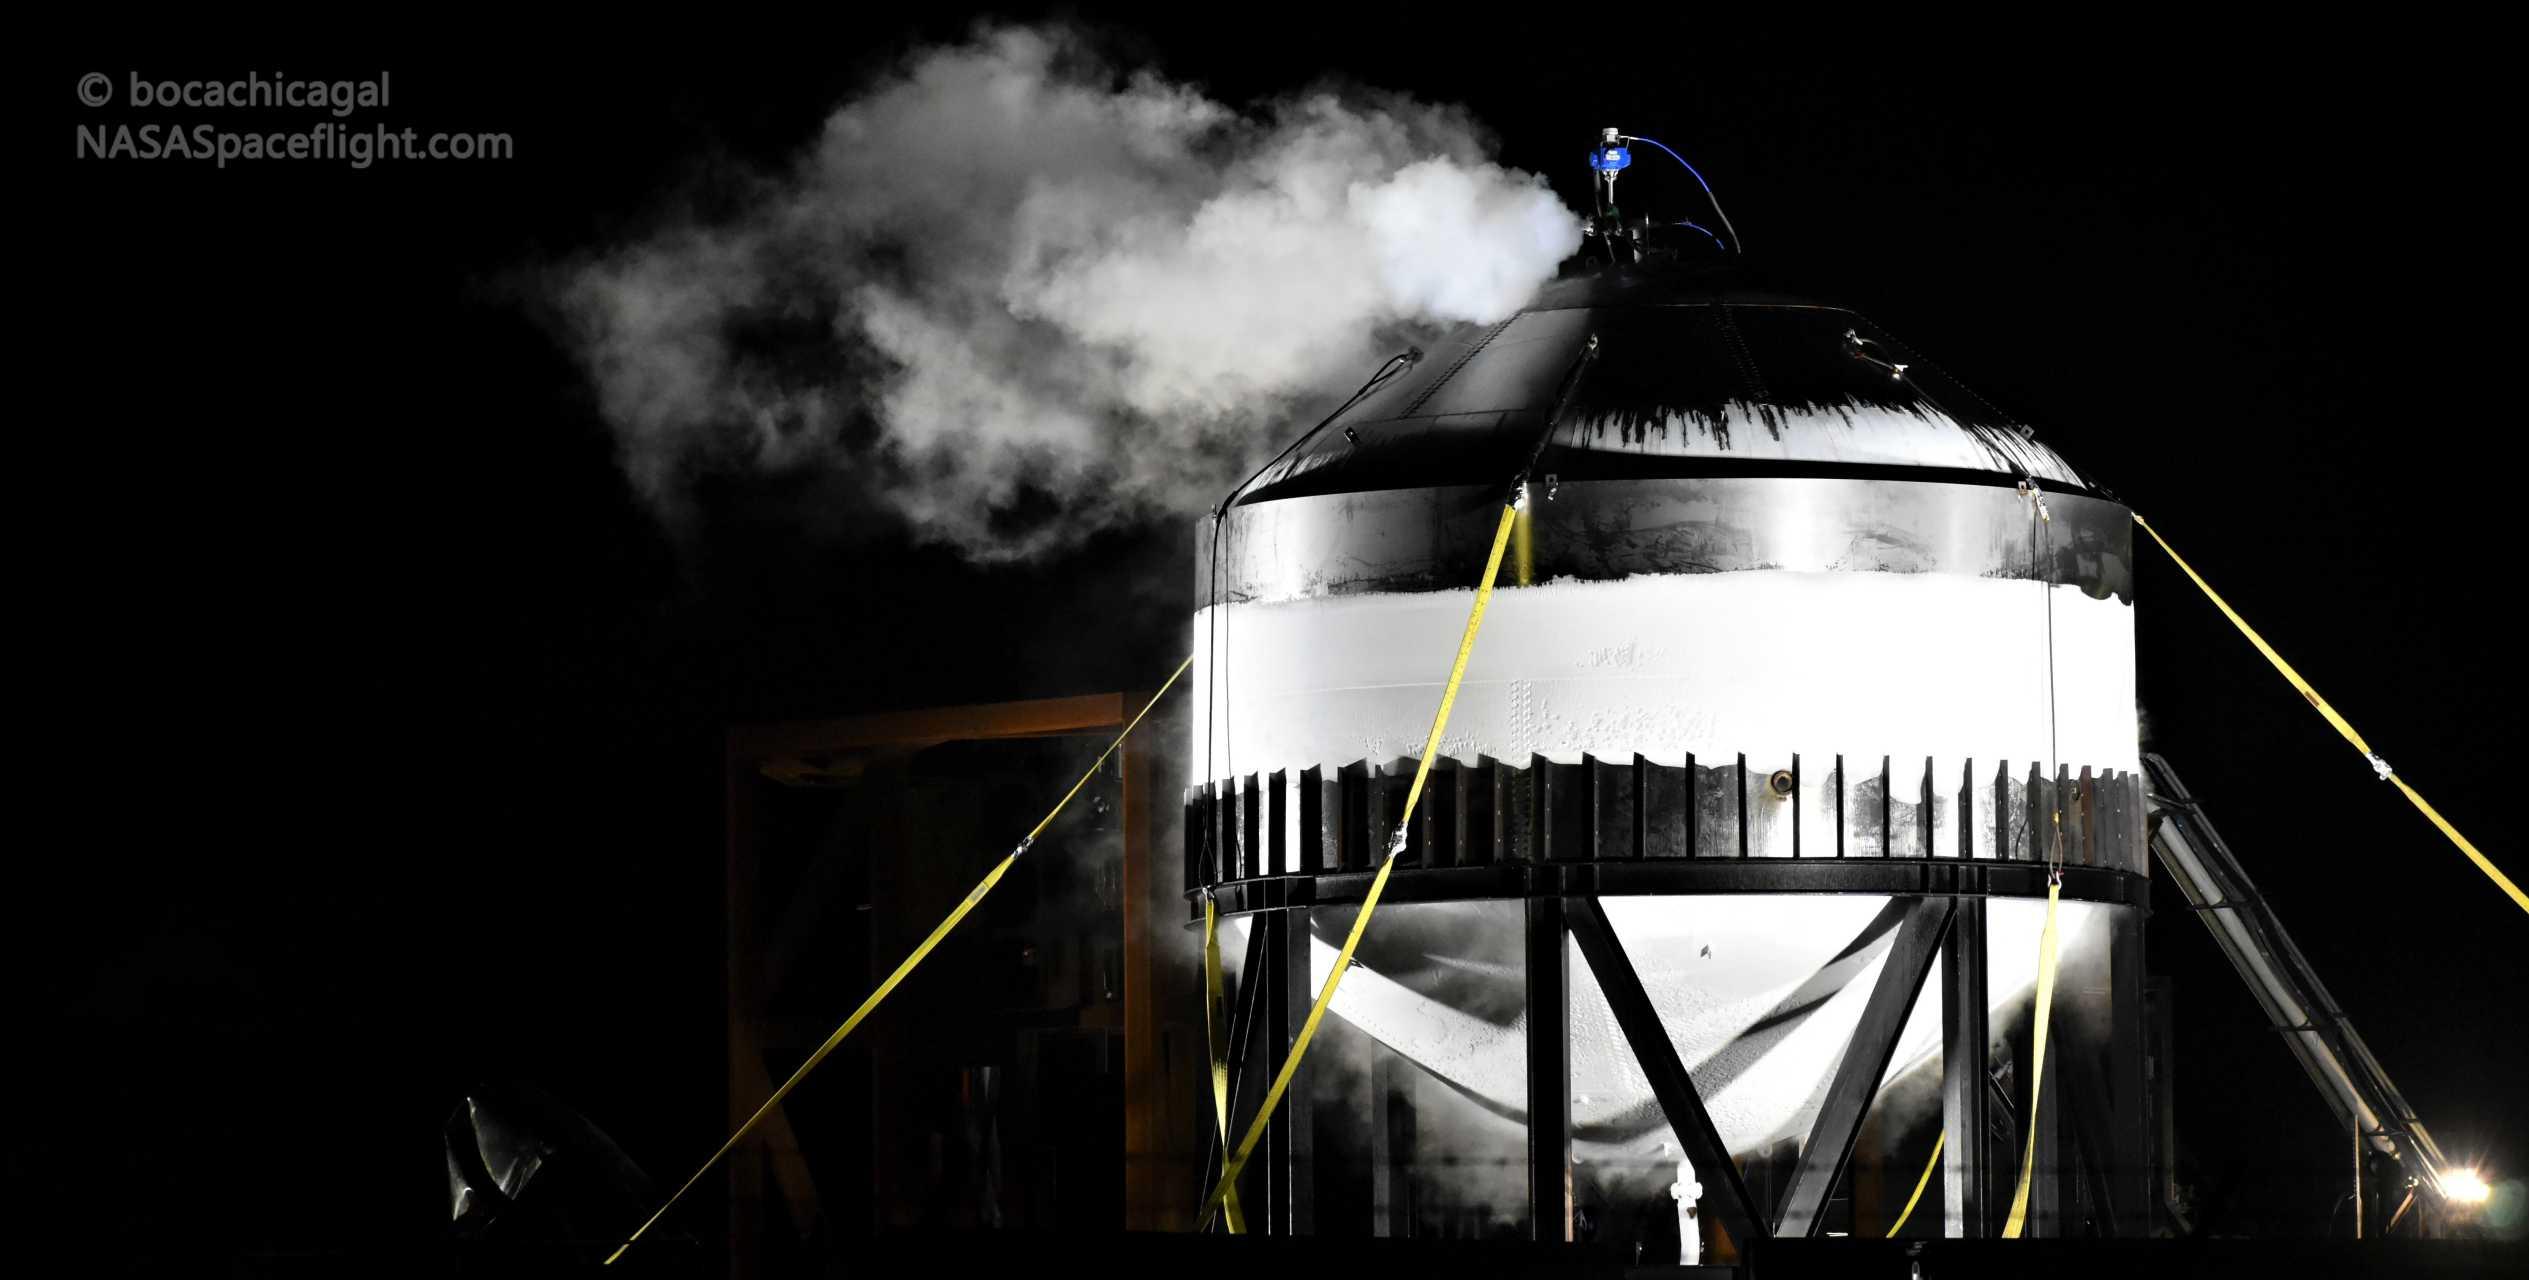 Starship Boca Chica 012820 (NASASpaceflight – bocachicagal) frosty test tank #2 5 crop (c)